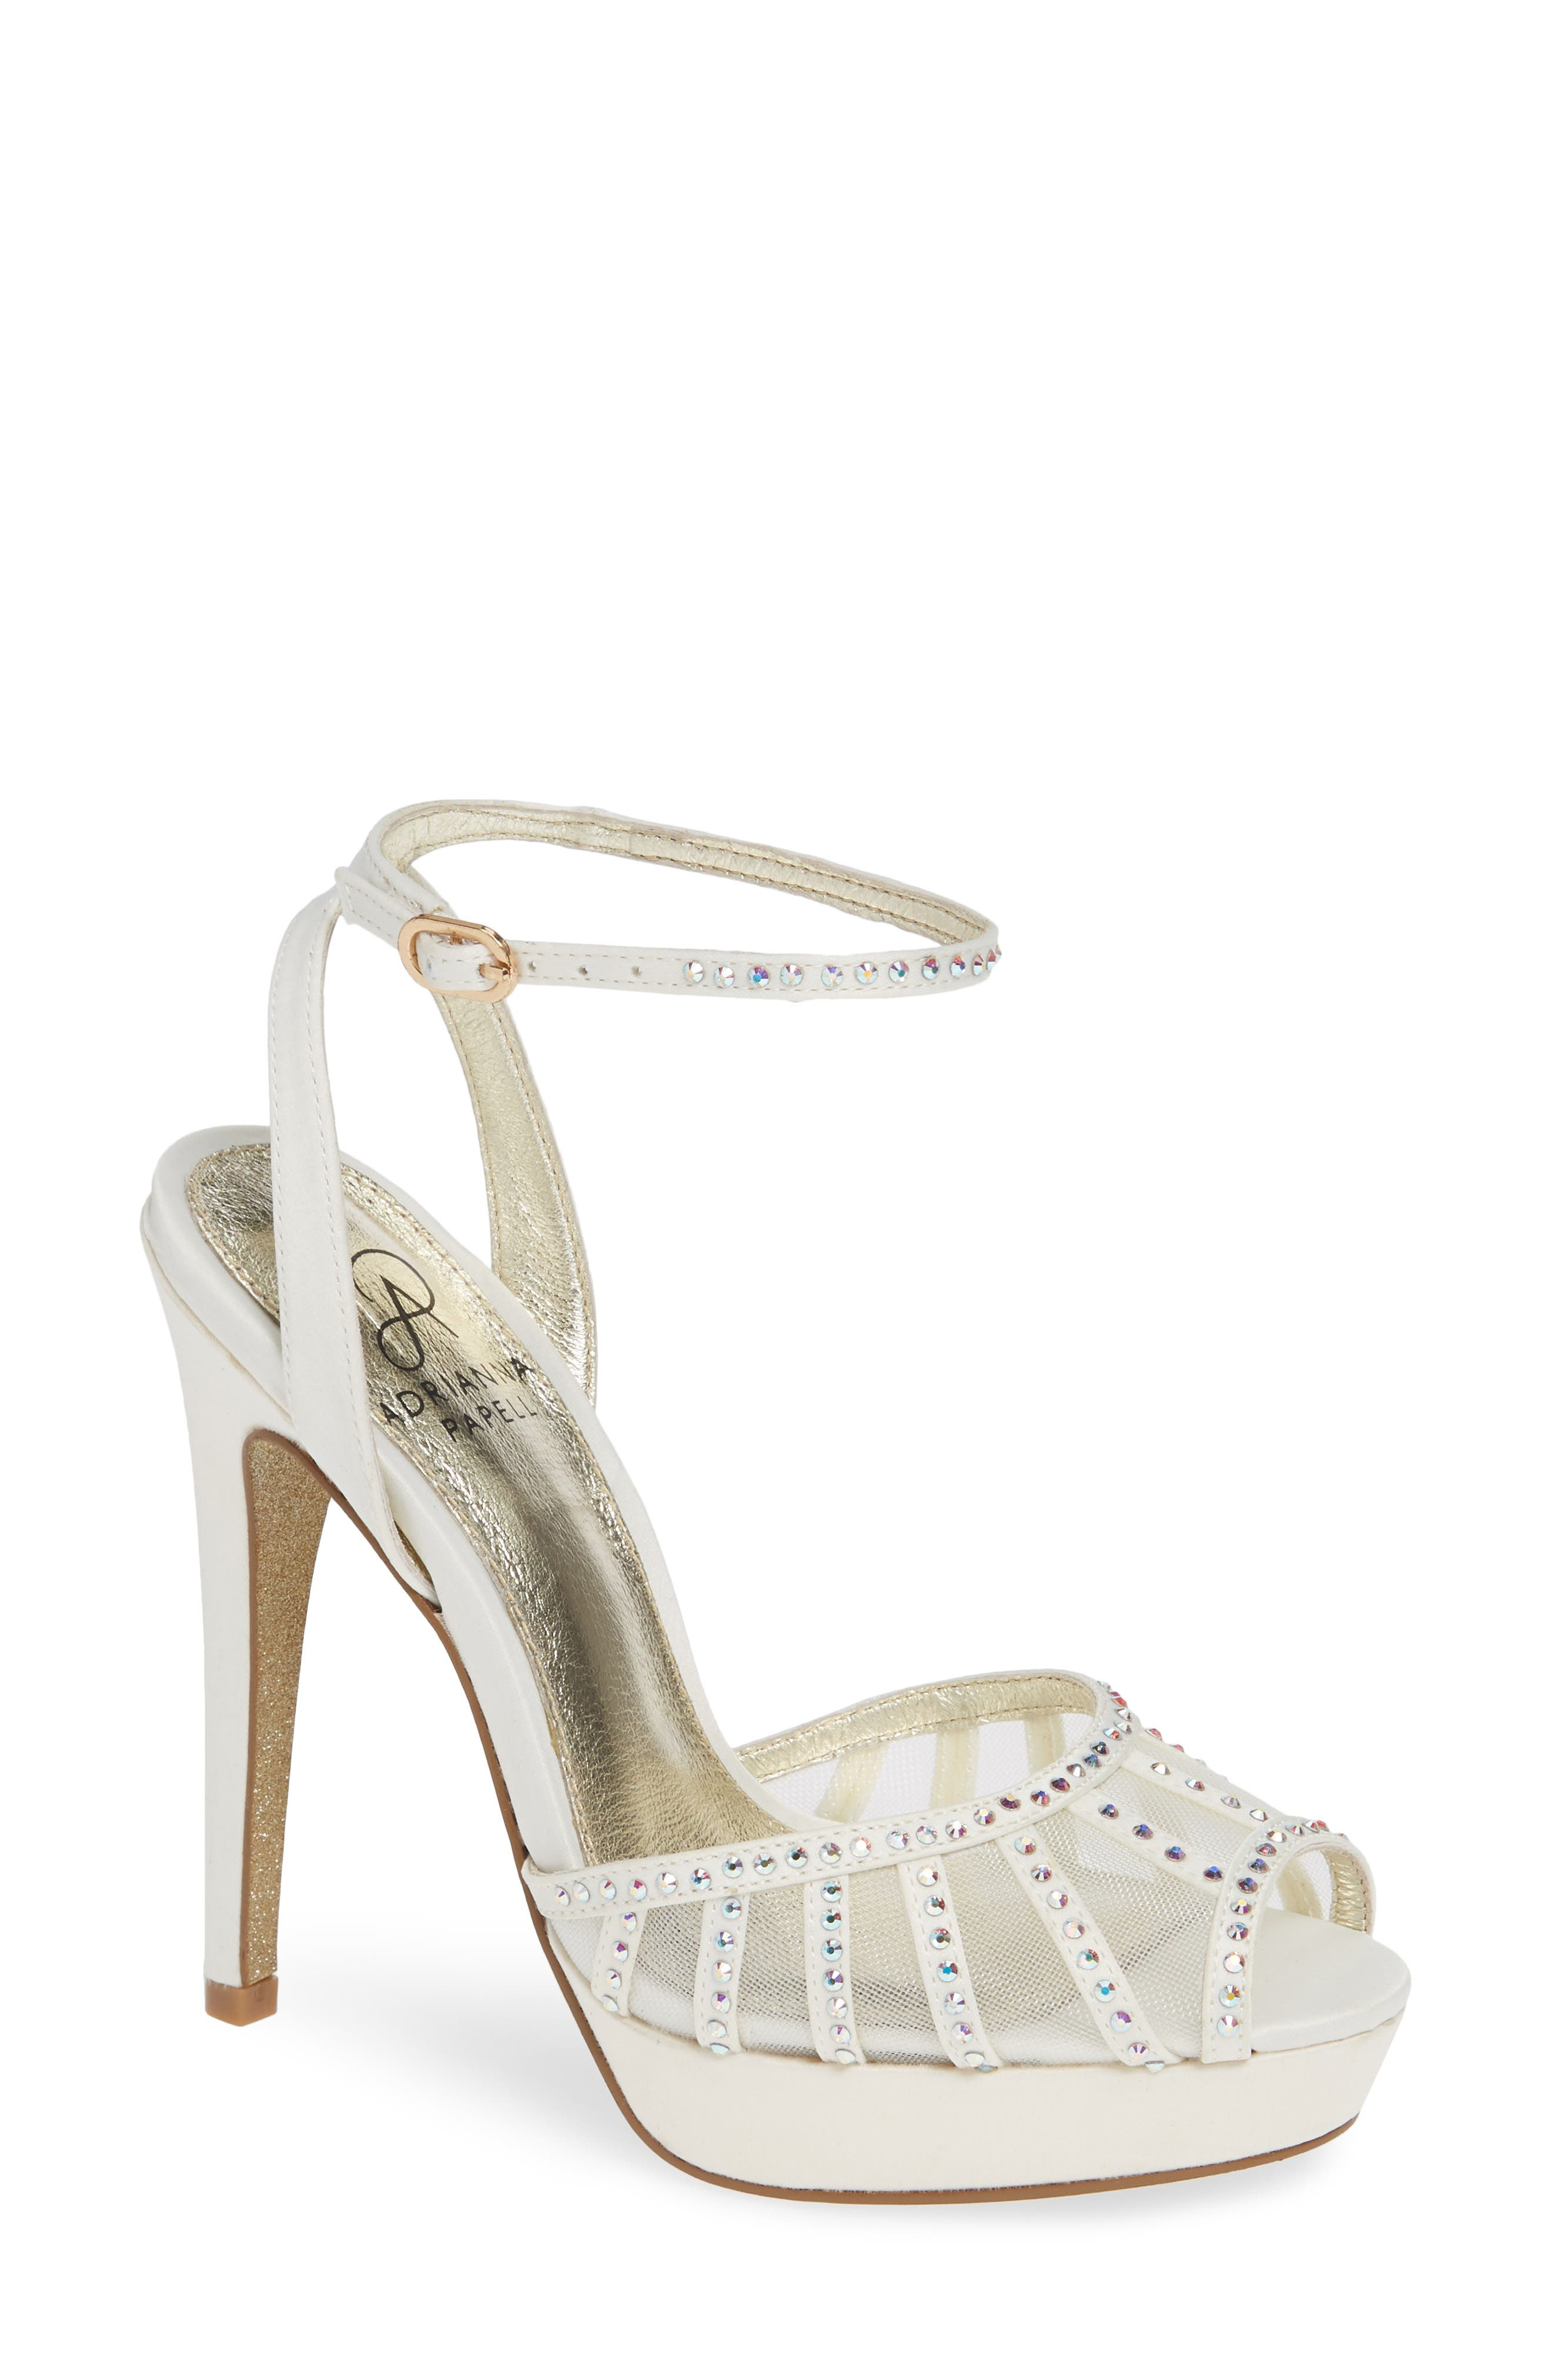 Simone Crystal Embellished Platform Sandal,                             Main thumbnail 4, color,